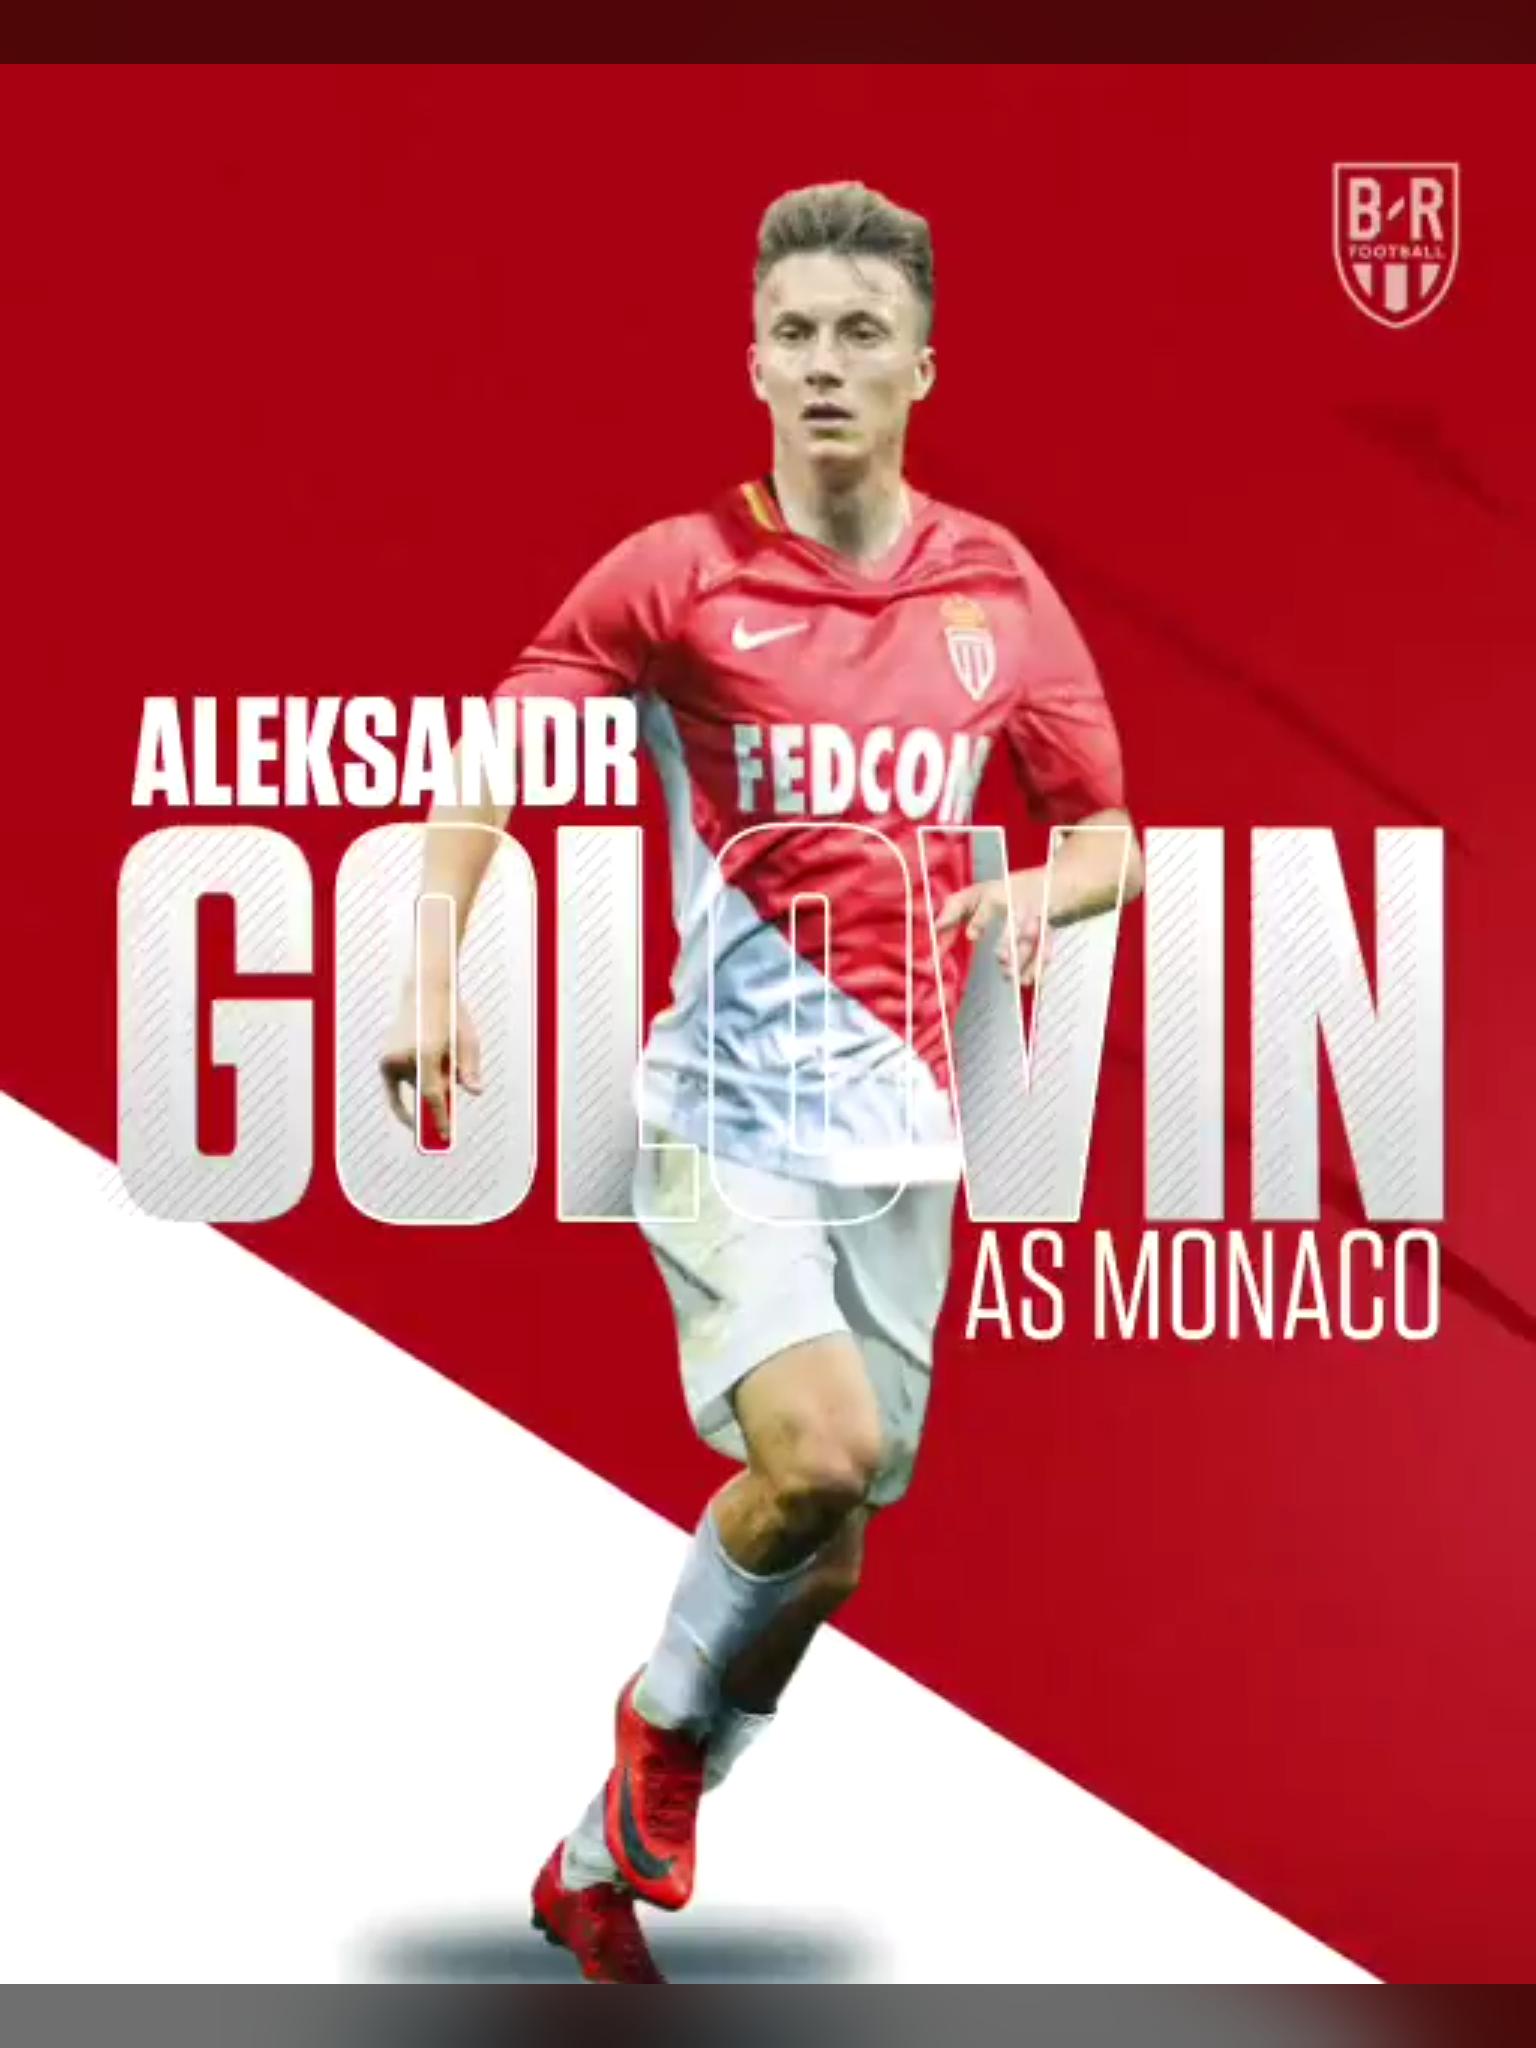 AS Monacos Aleksander Golovin Credit To brfootball On Twitter 1536x2048